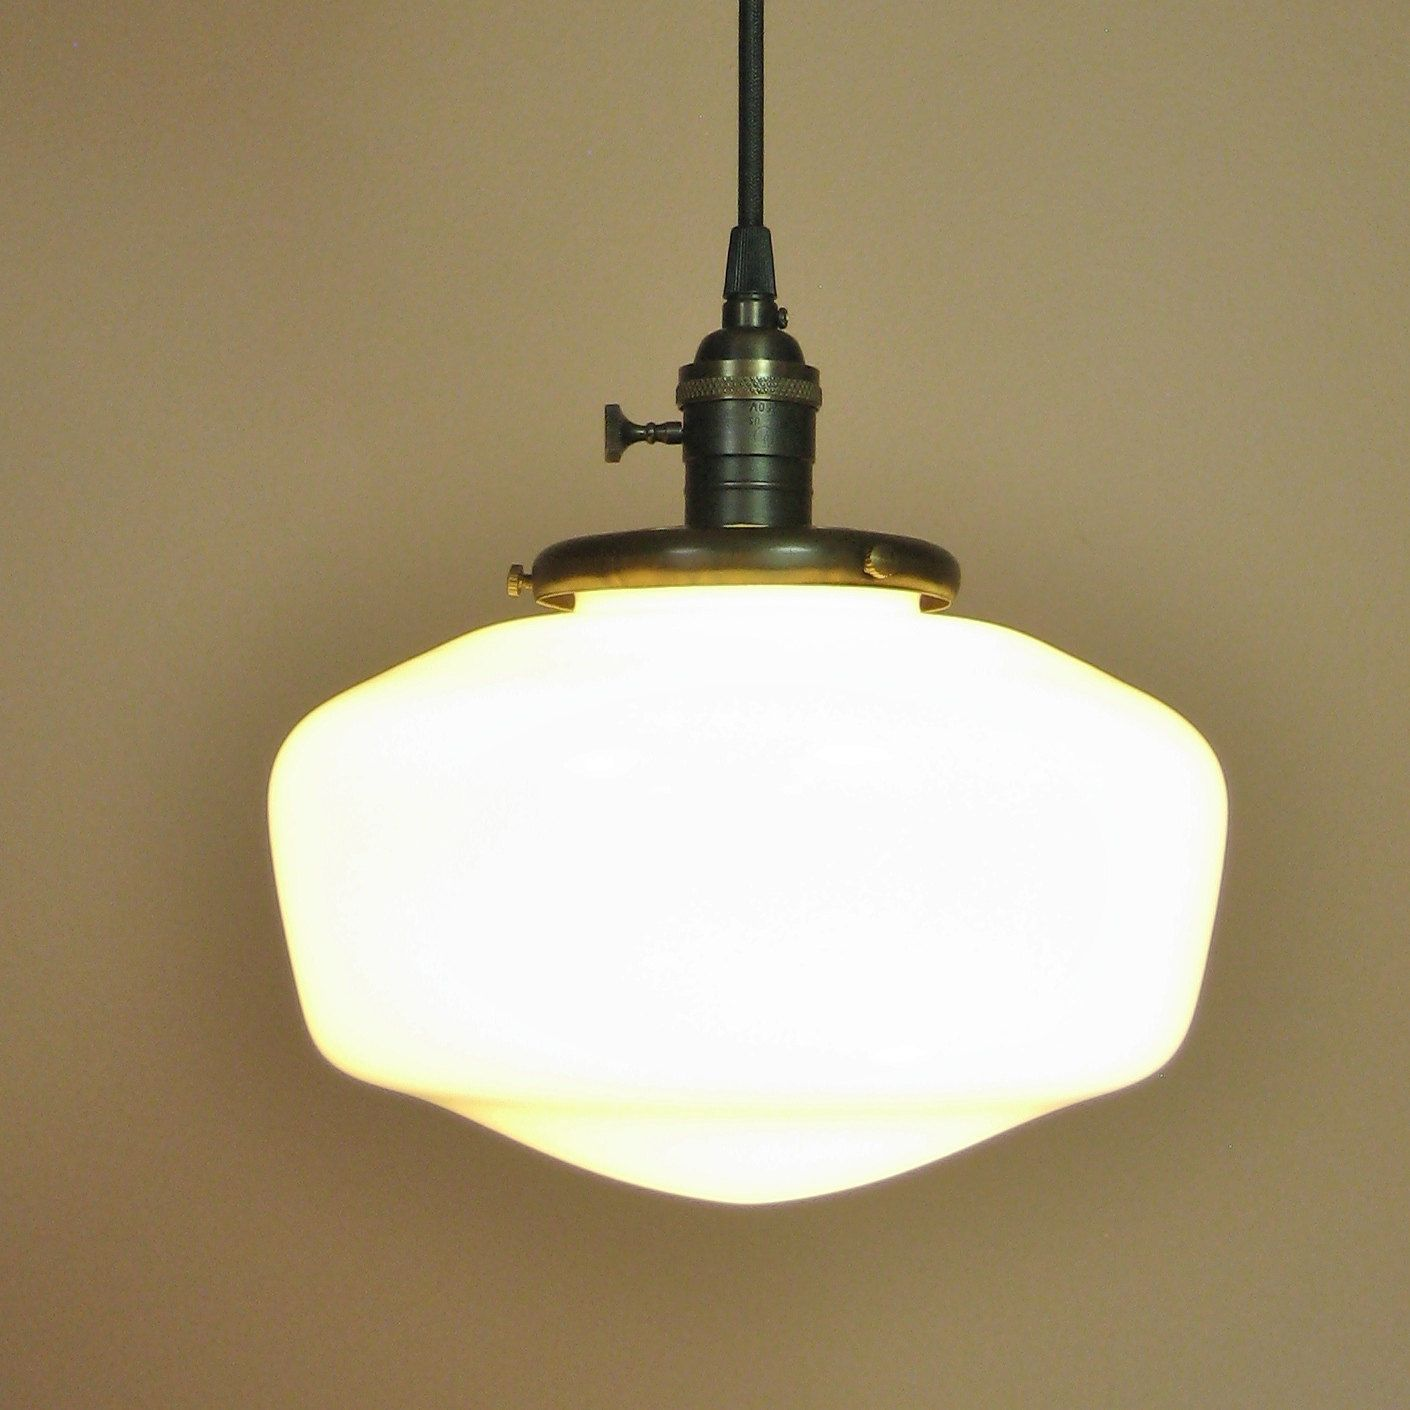 Schoolhouse pendant light come on in pinterest pendant